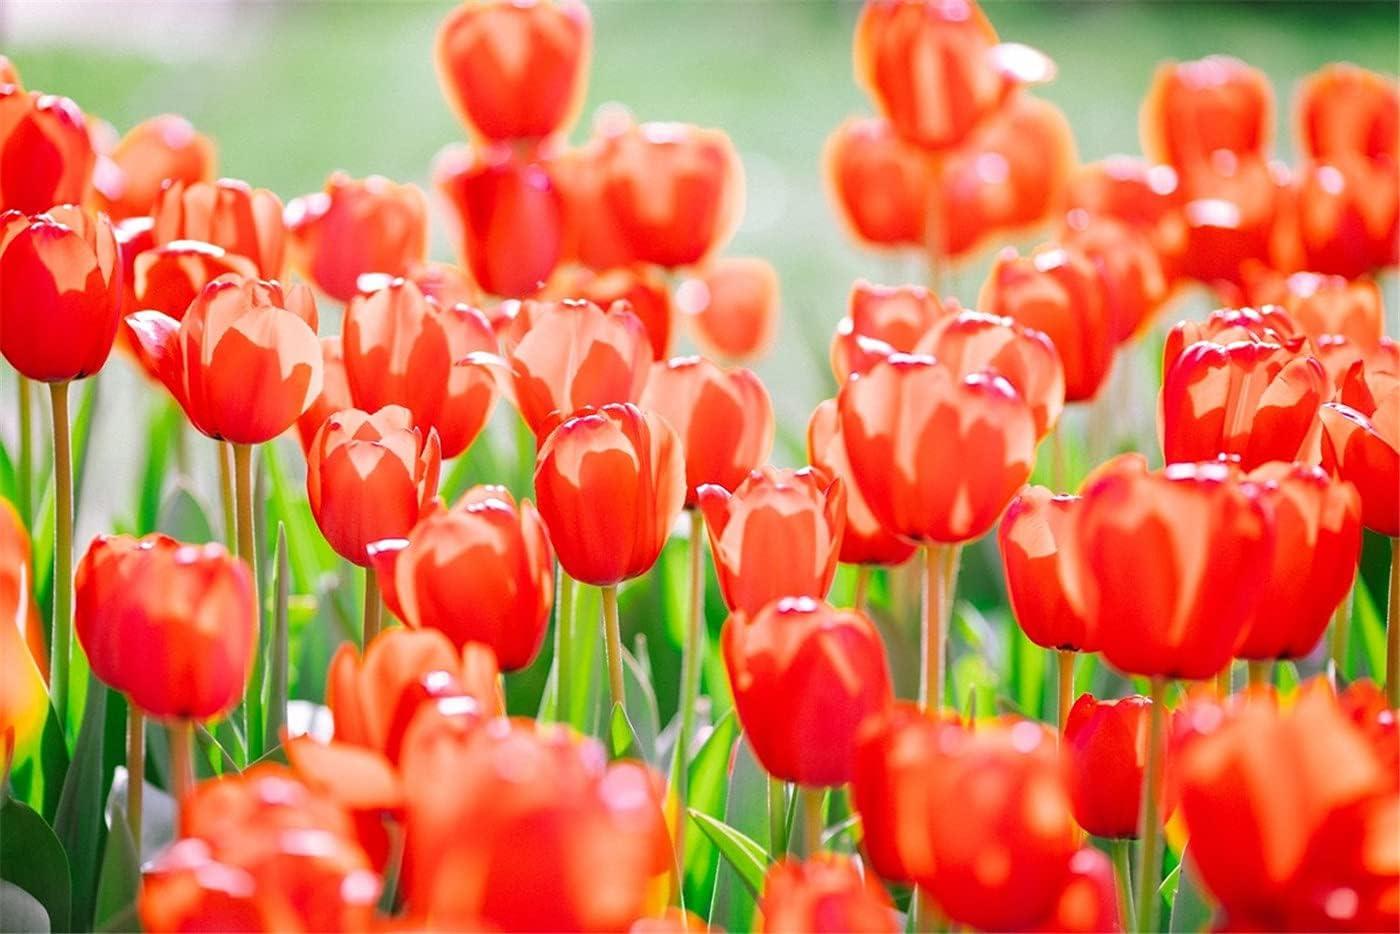 Tulip Rhizomes Lovely Time sale Super special price Flowers Unique Decora Shape Party Splendid